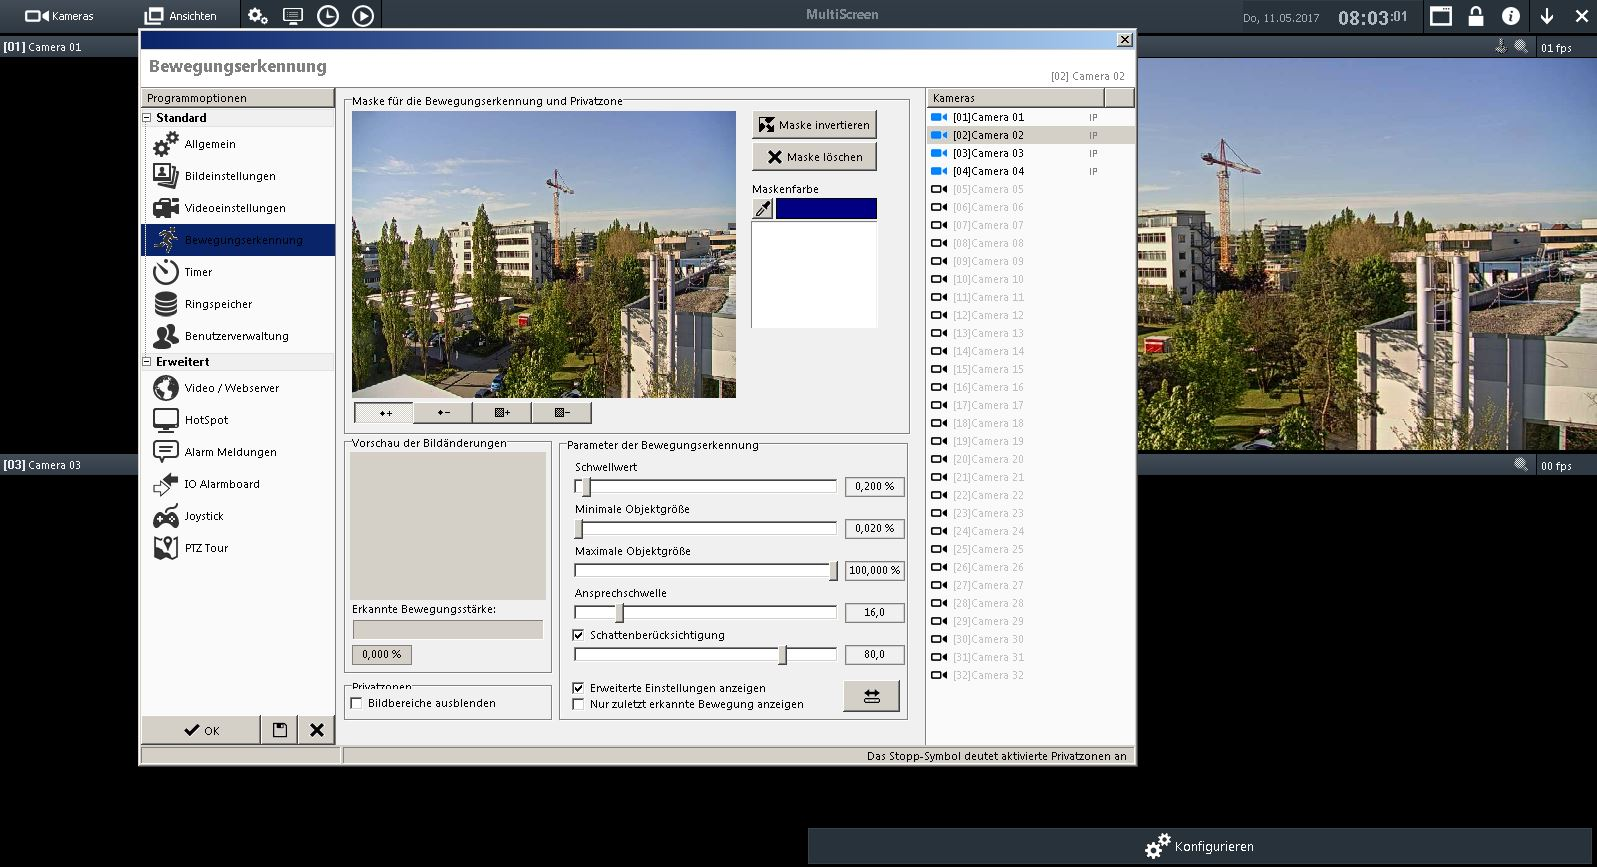 VideoControl Net - Bewegungserkennung